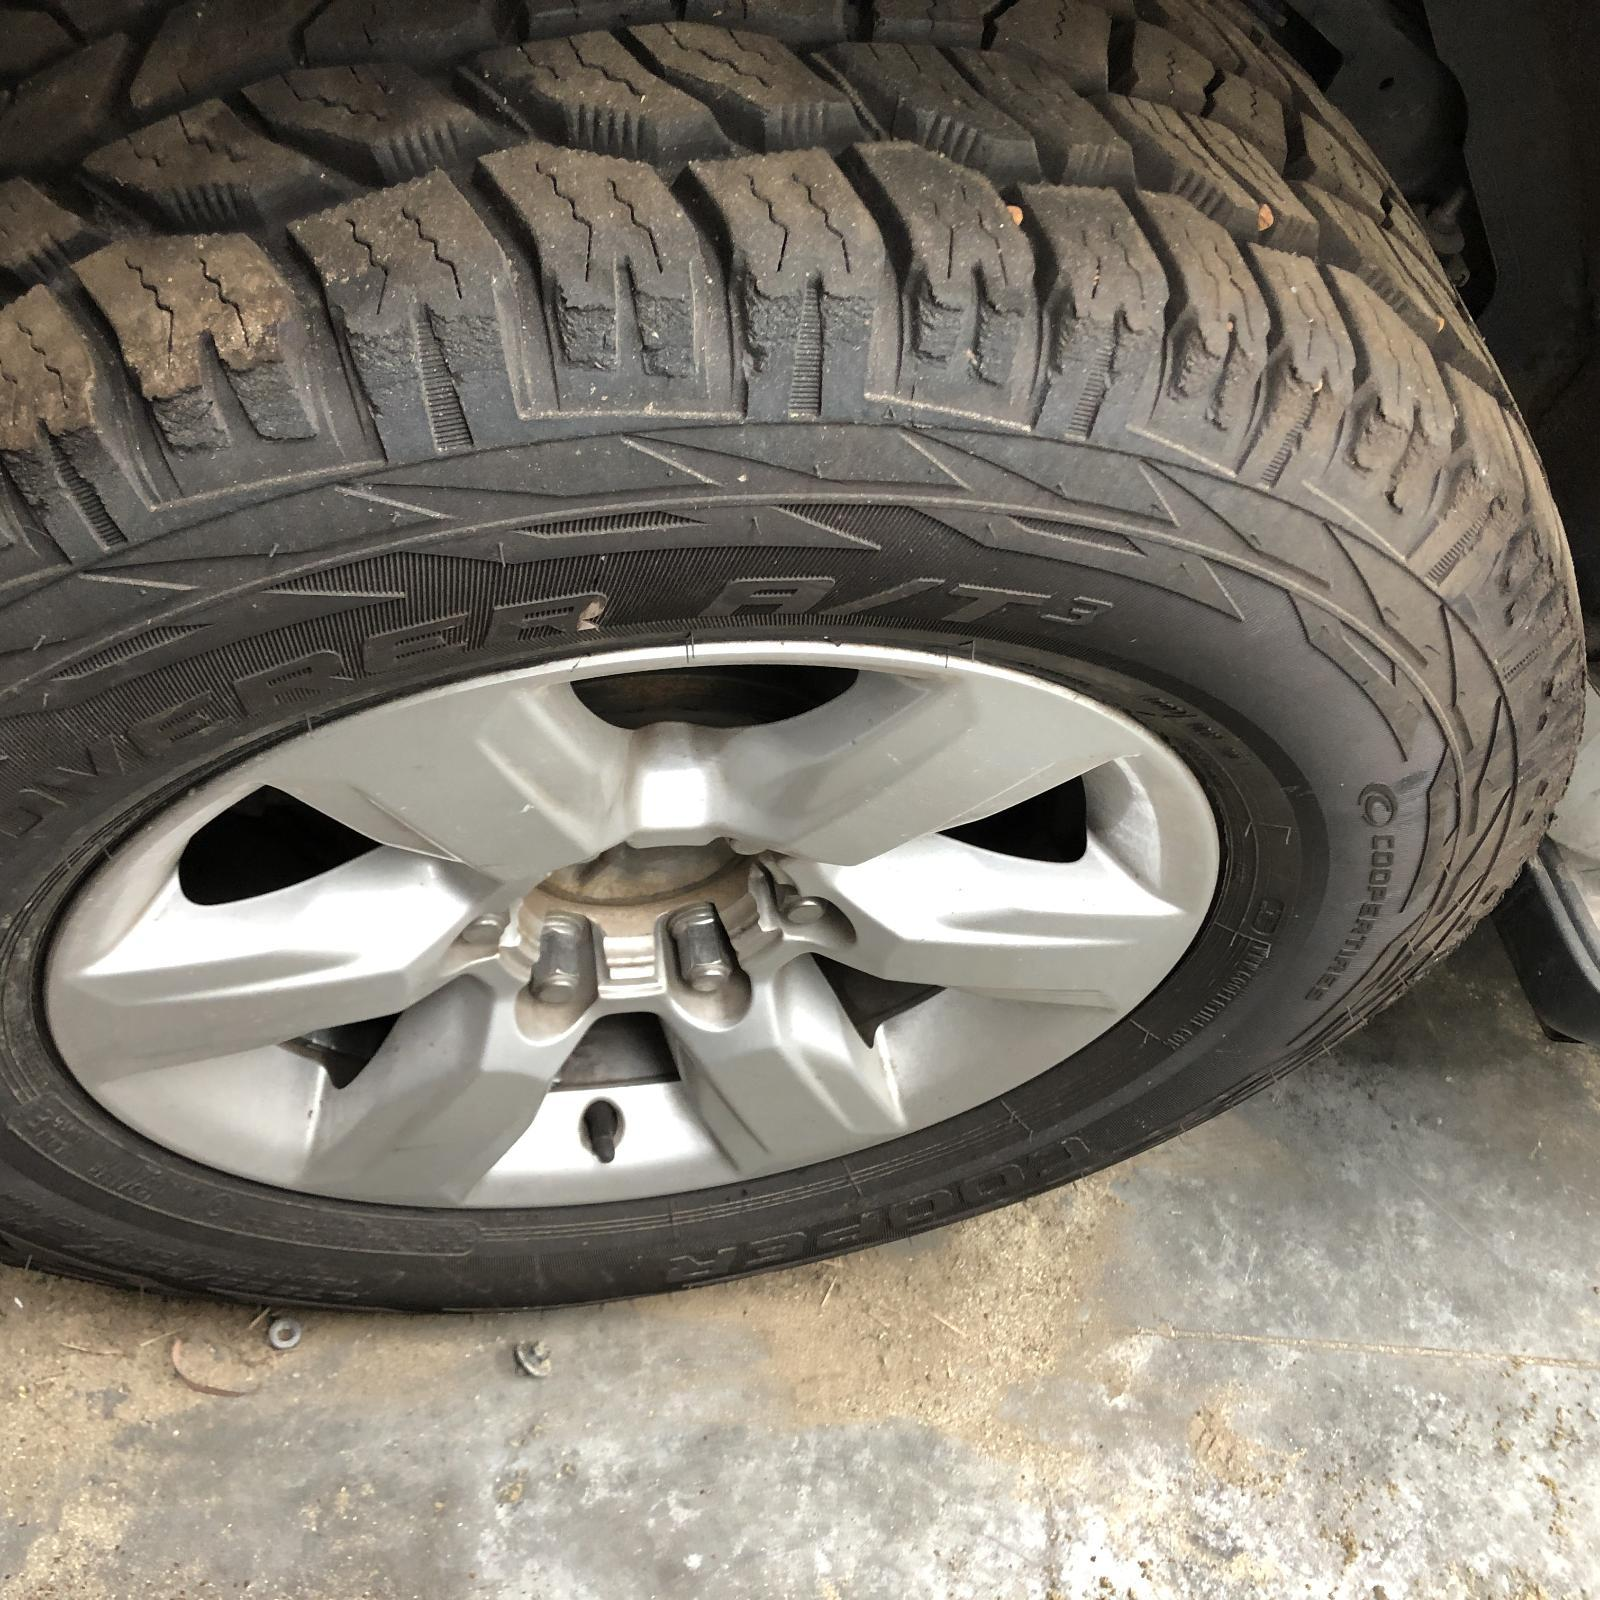 TOYOTA PRADO, Wheel Mag, FACTORY, 17X7.5IN, 150 SERIES, GXL, 11/09-09/17